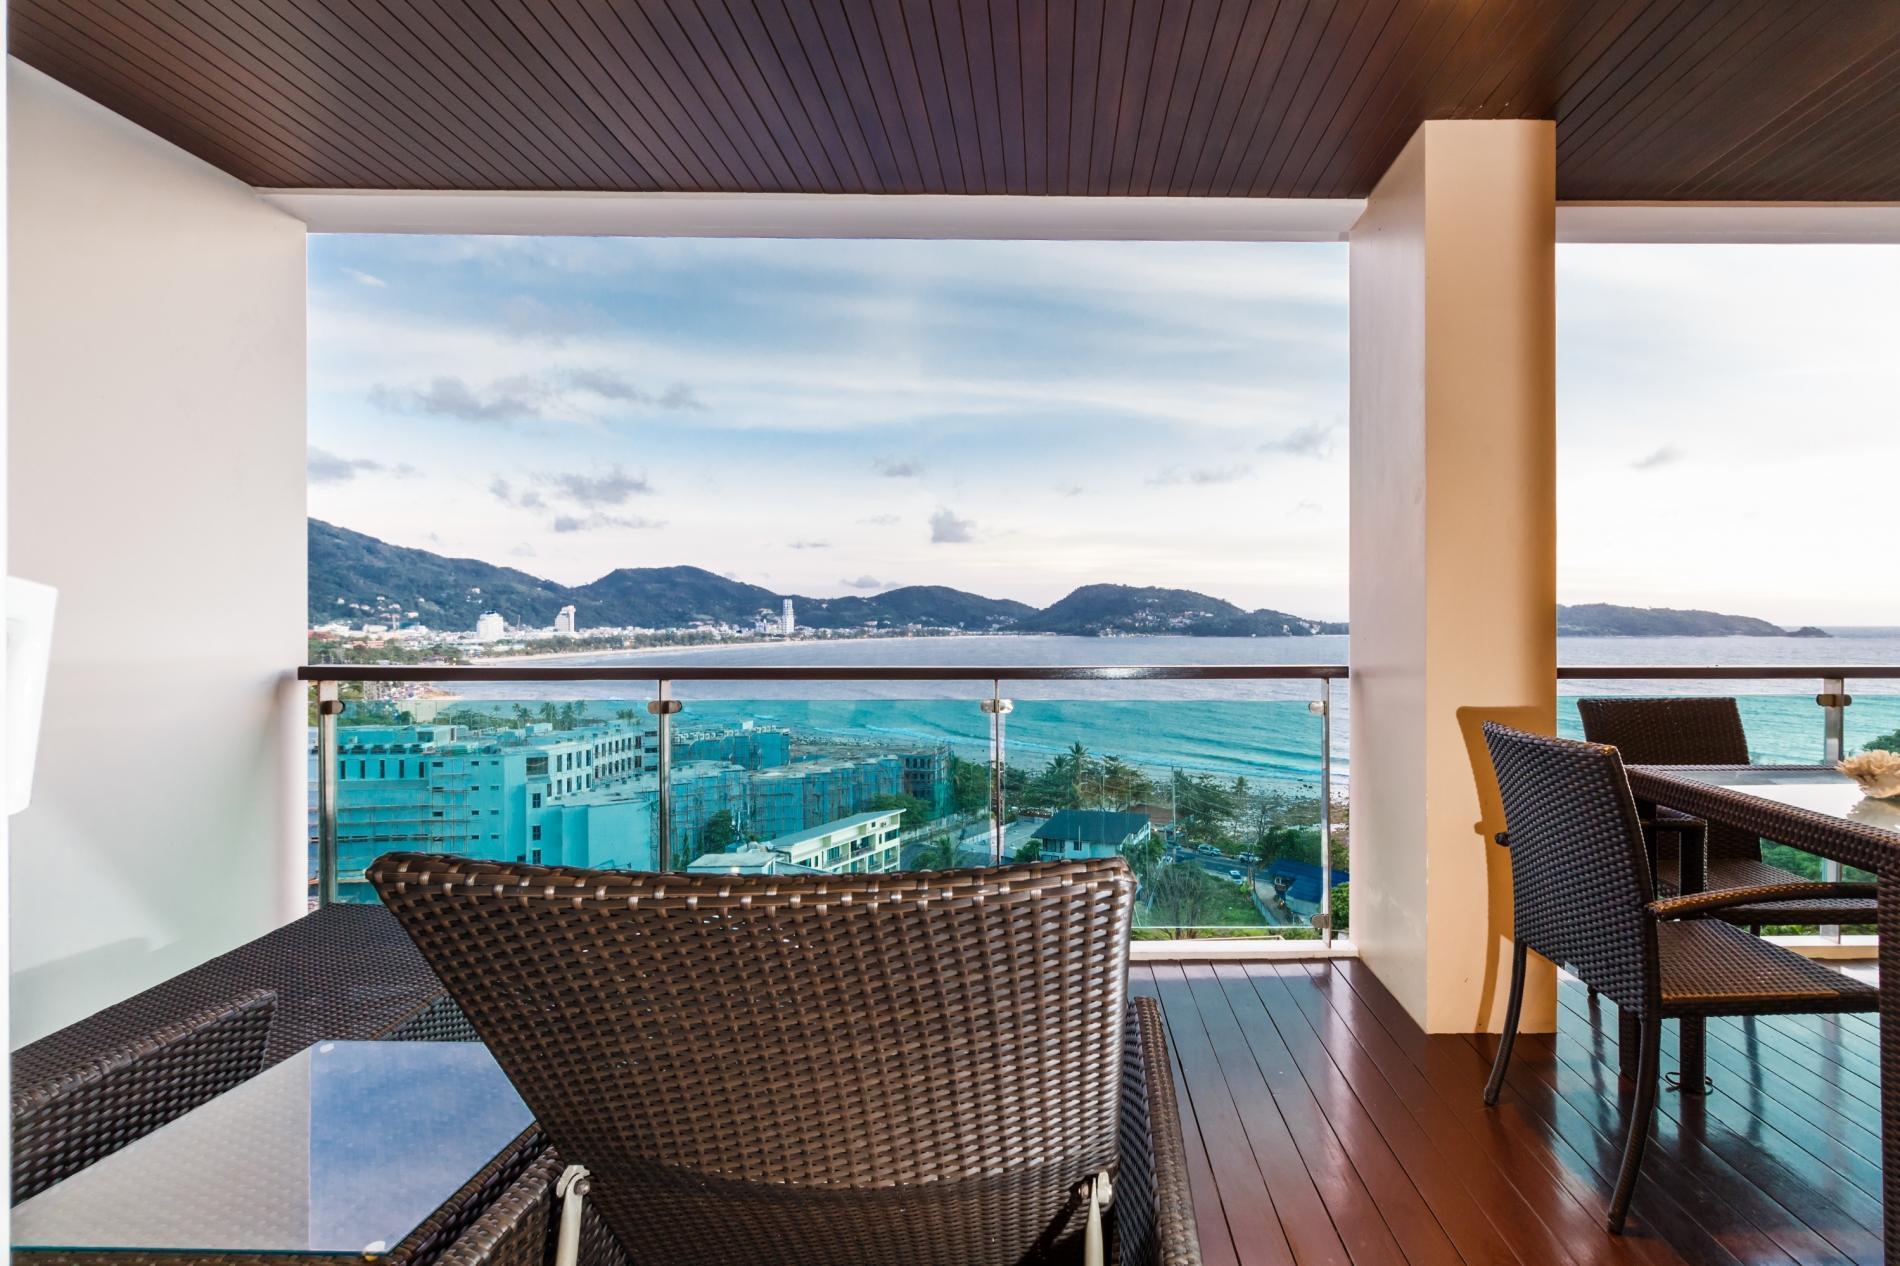 Apartment Privilege12 - Seaview 3 bedroom luxury apartment on Kalim bay photo 16515858